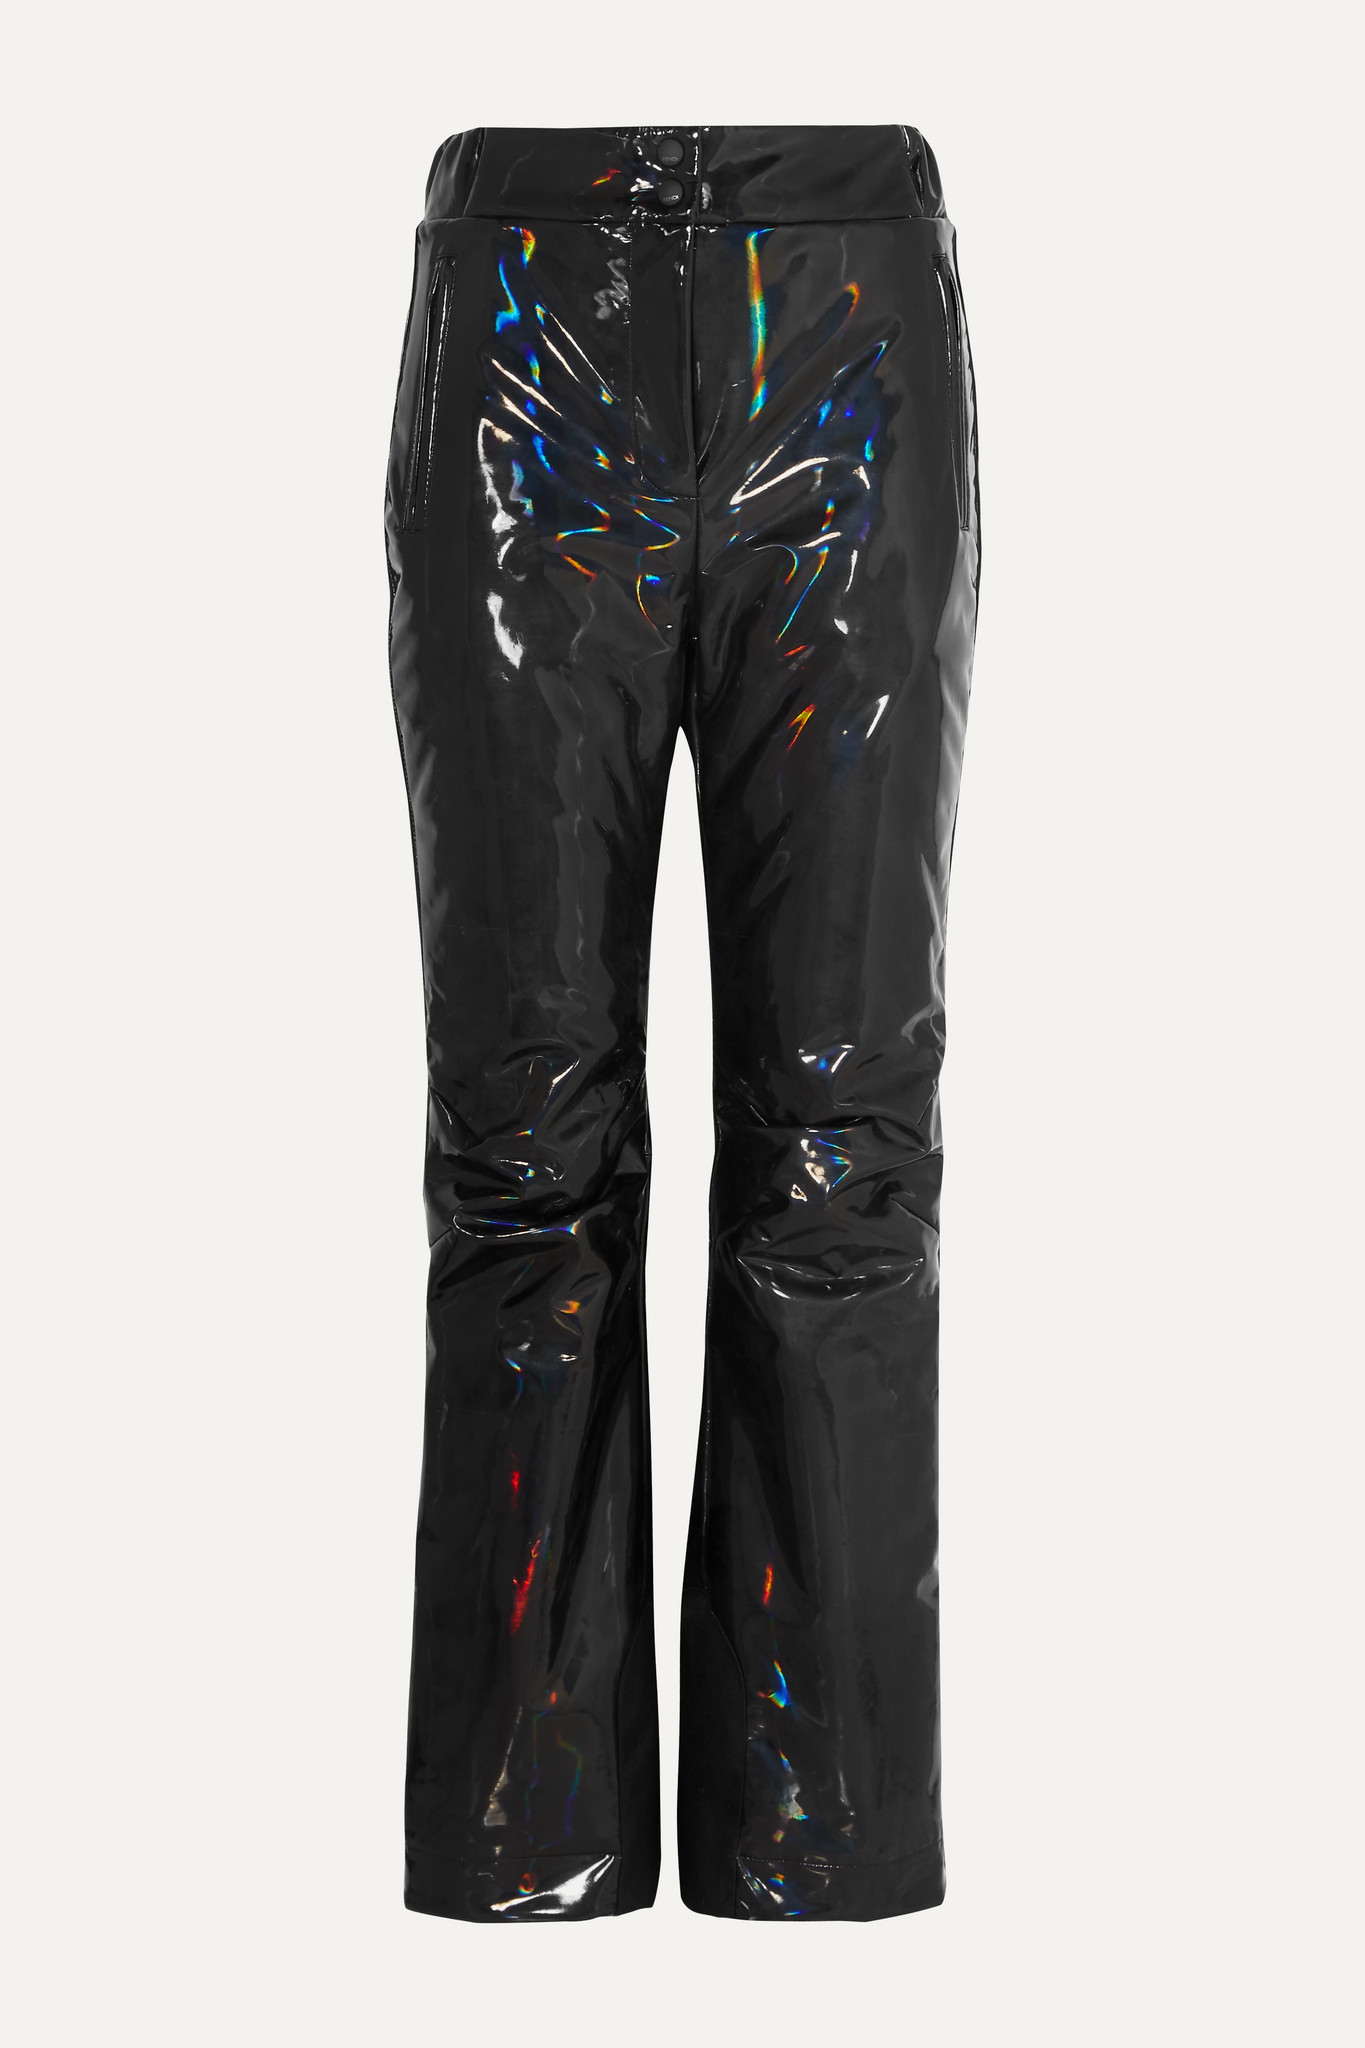 FENDI - 贴花全息填充滑雪裤 - 黑色 - IT42